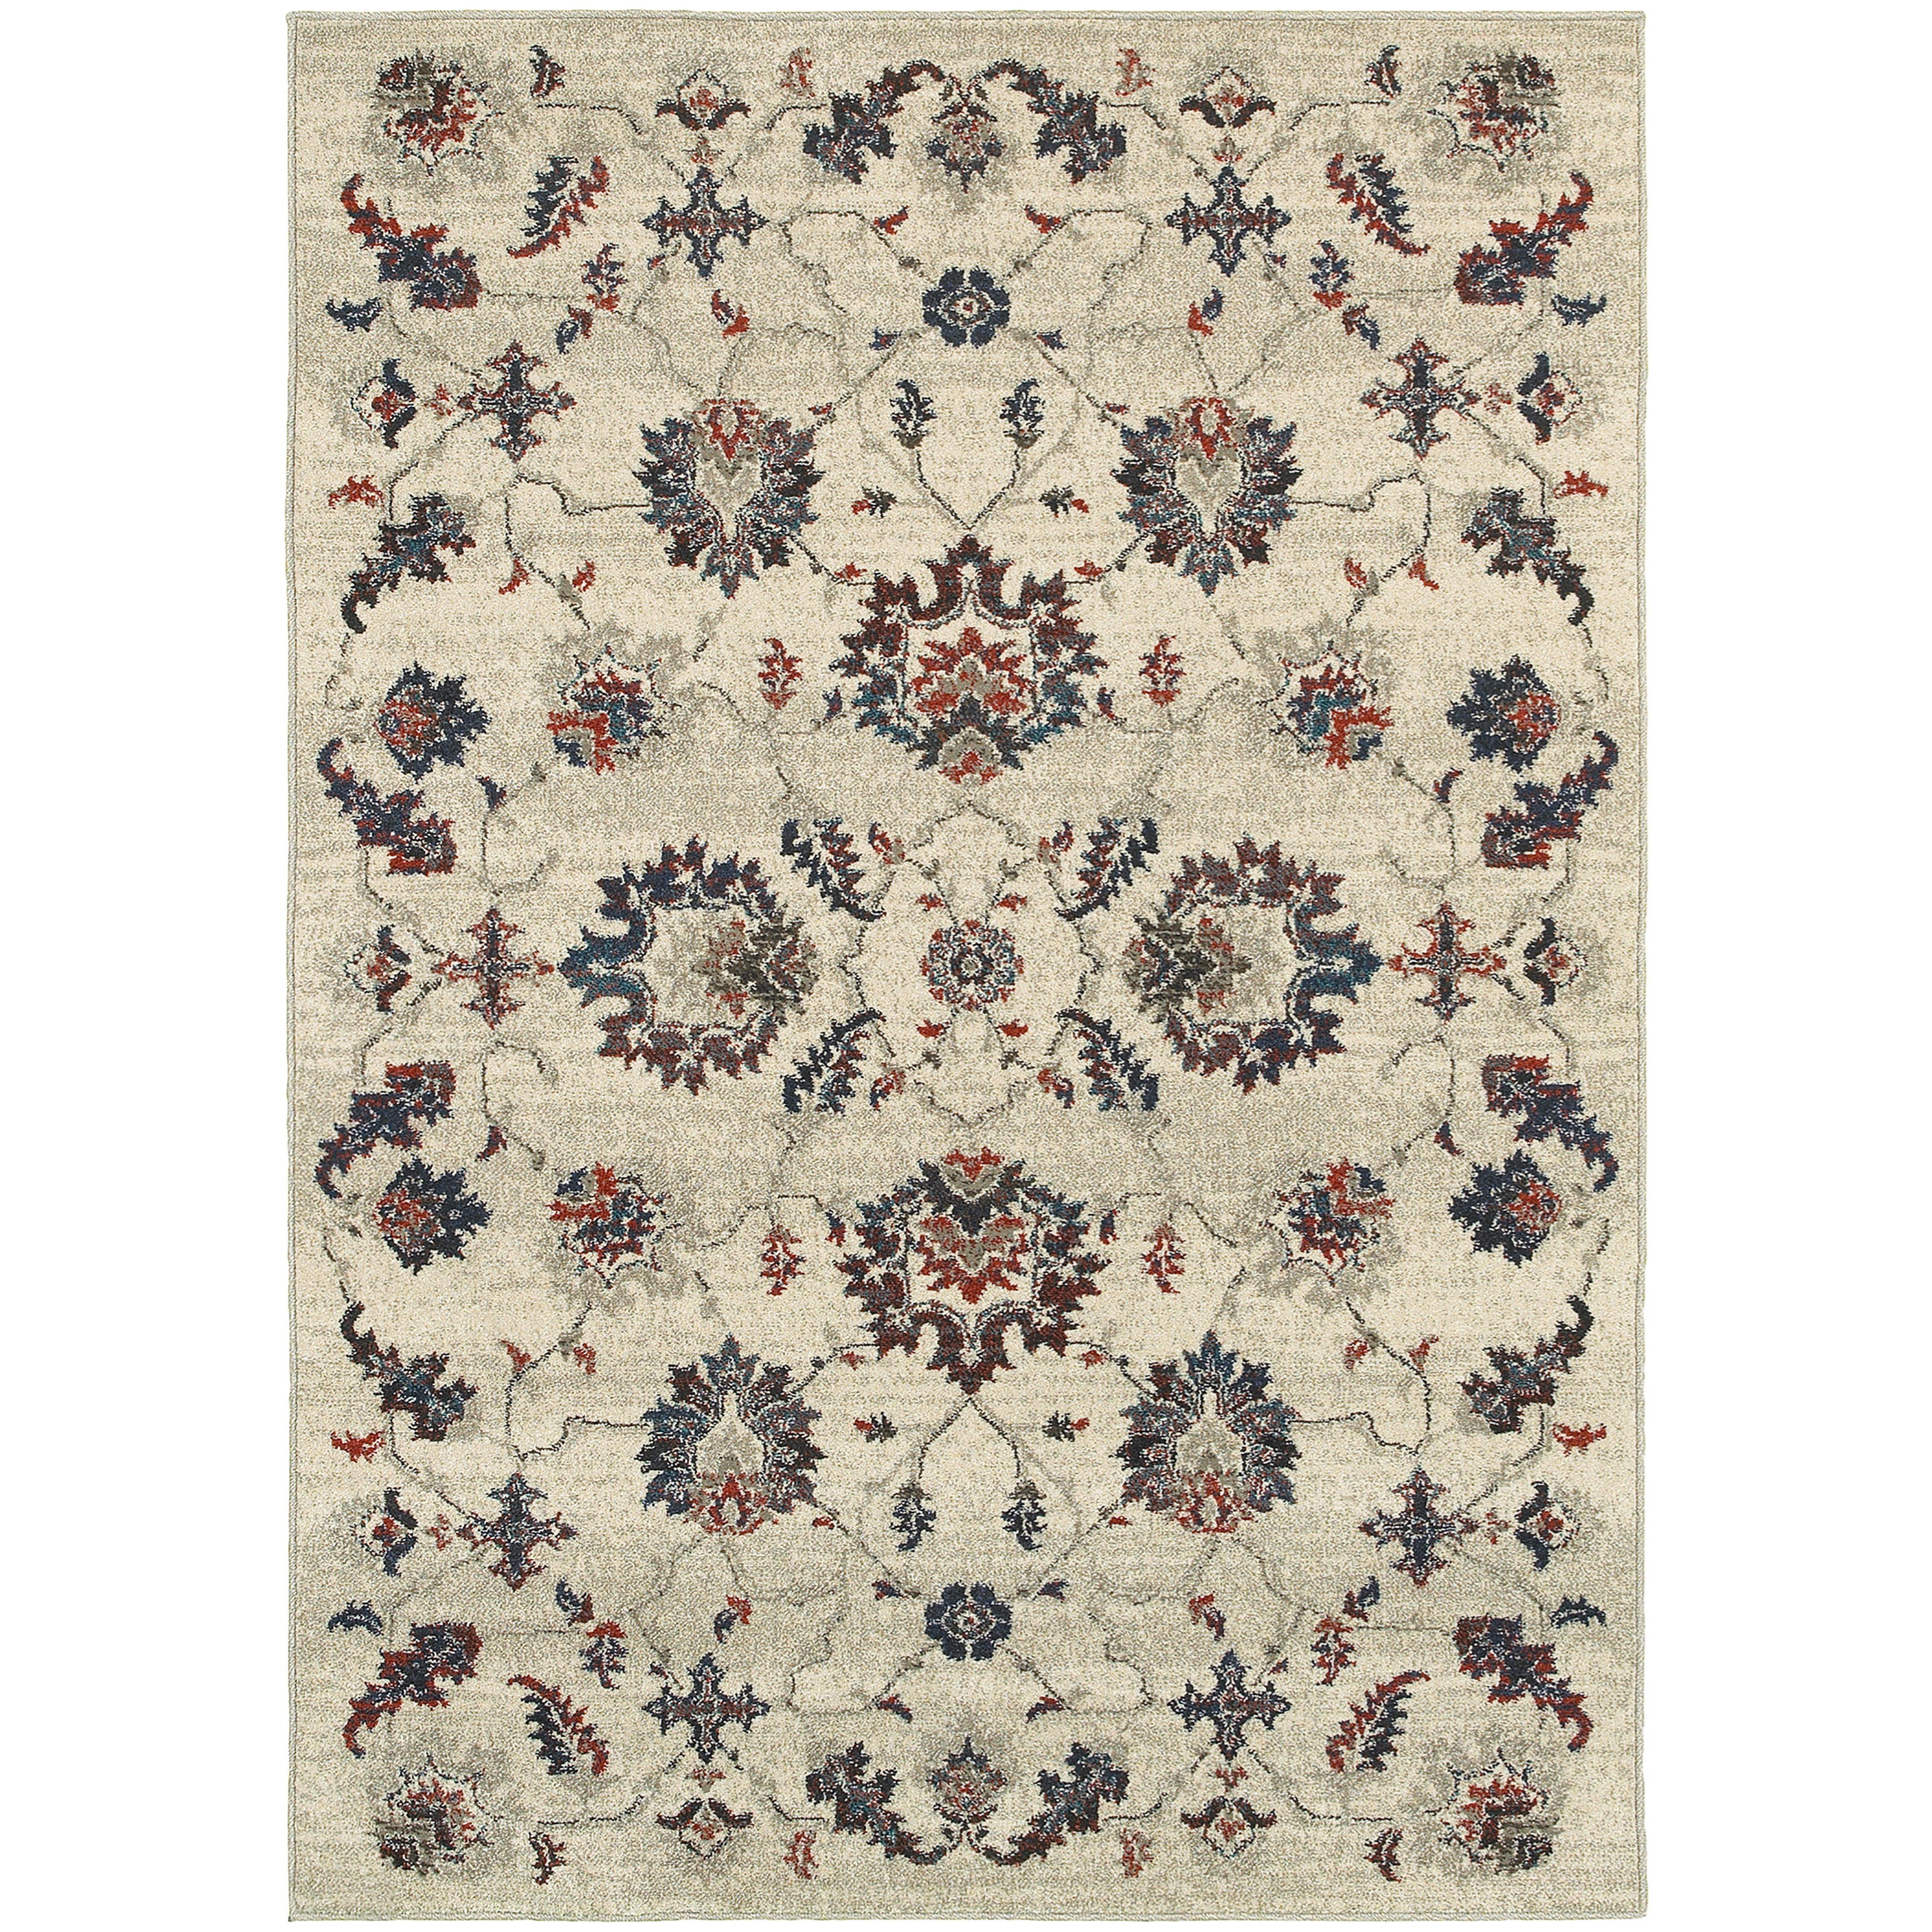 "Oriental Weavers Highlands 3'10"" X  5' 5"" Rectangle Area Rug - Item Number: HIG6684B310X55"